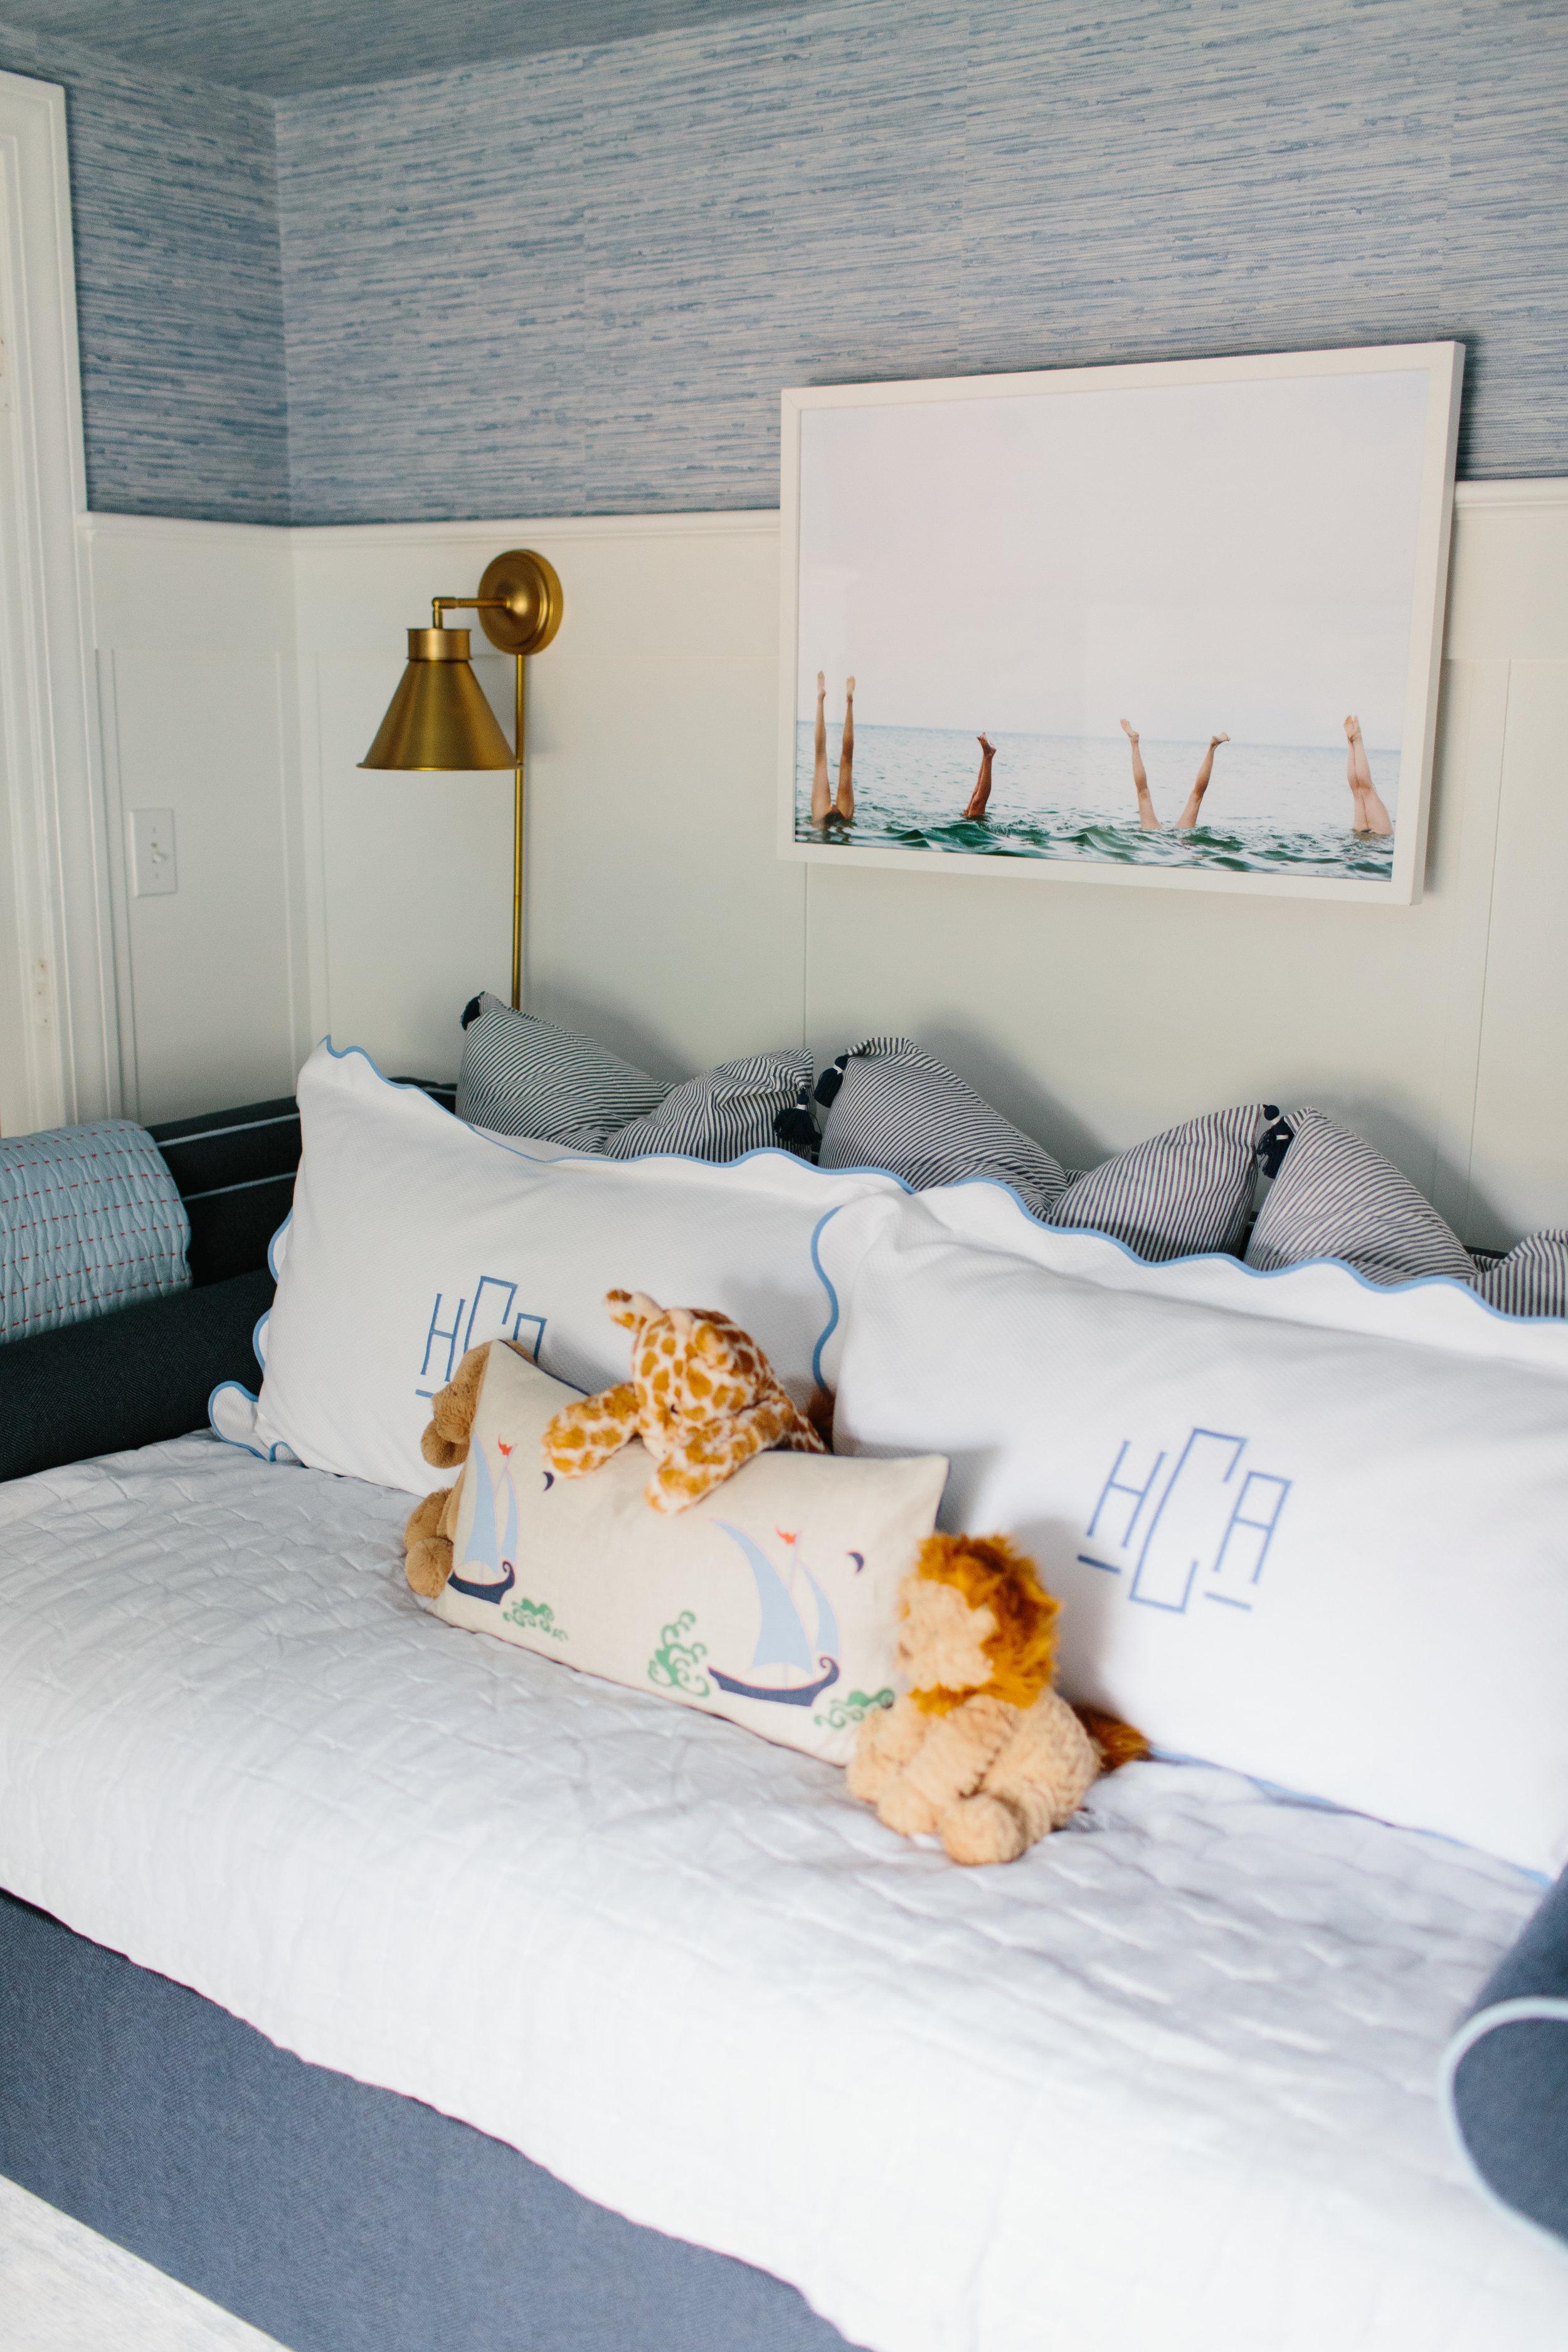 Nautical Nursery Boys Bedroom Blue Wallpaper by Abby Capalbo   Photography: Erin McGinn